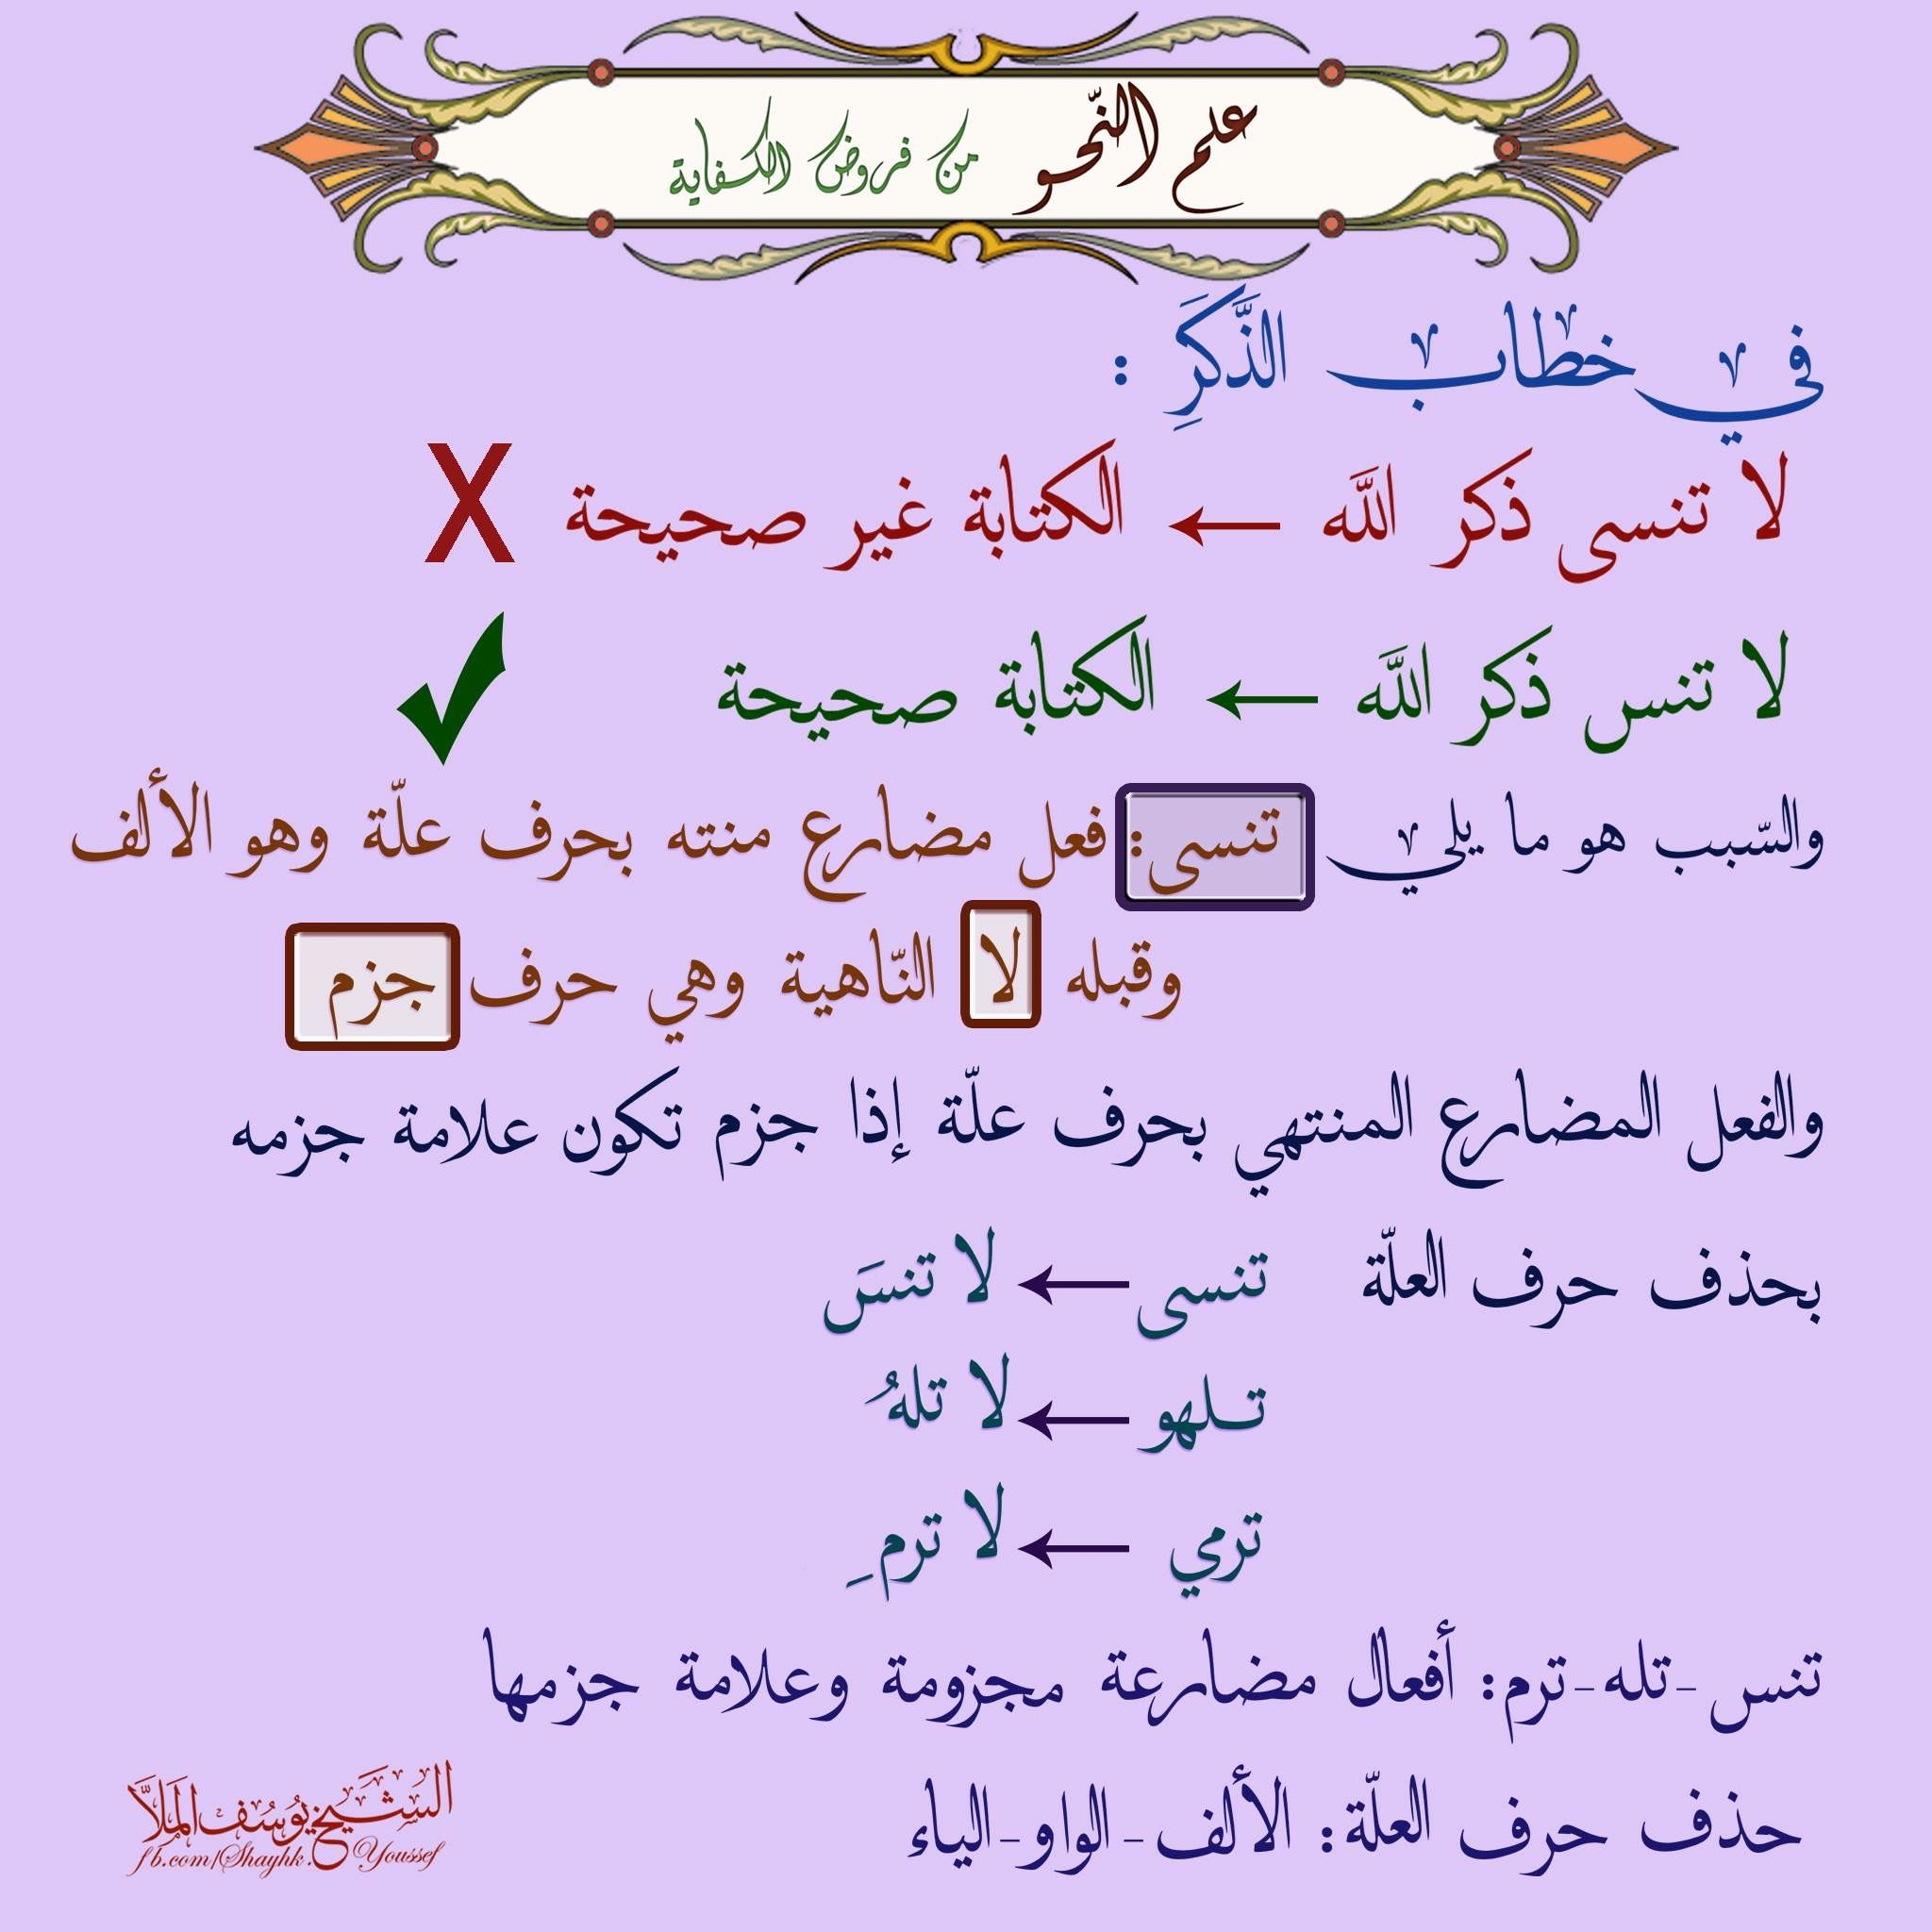 Pin By Khaled Bahnasawy On لغتنا العربية Math Math Equations Equation